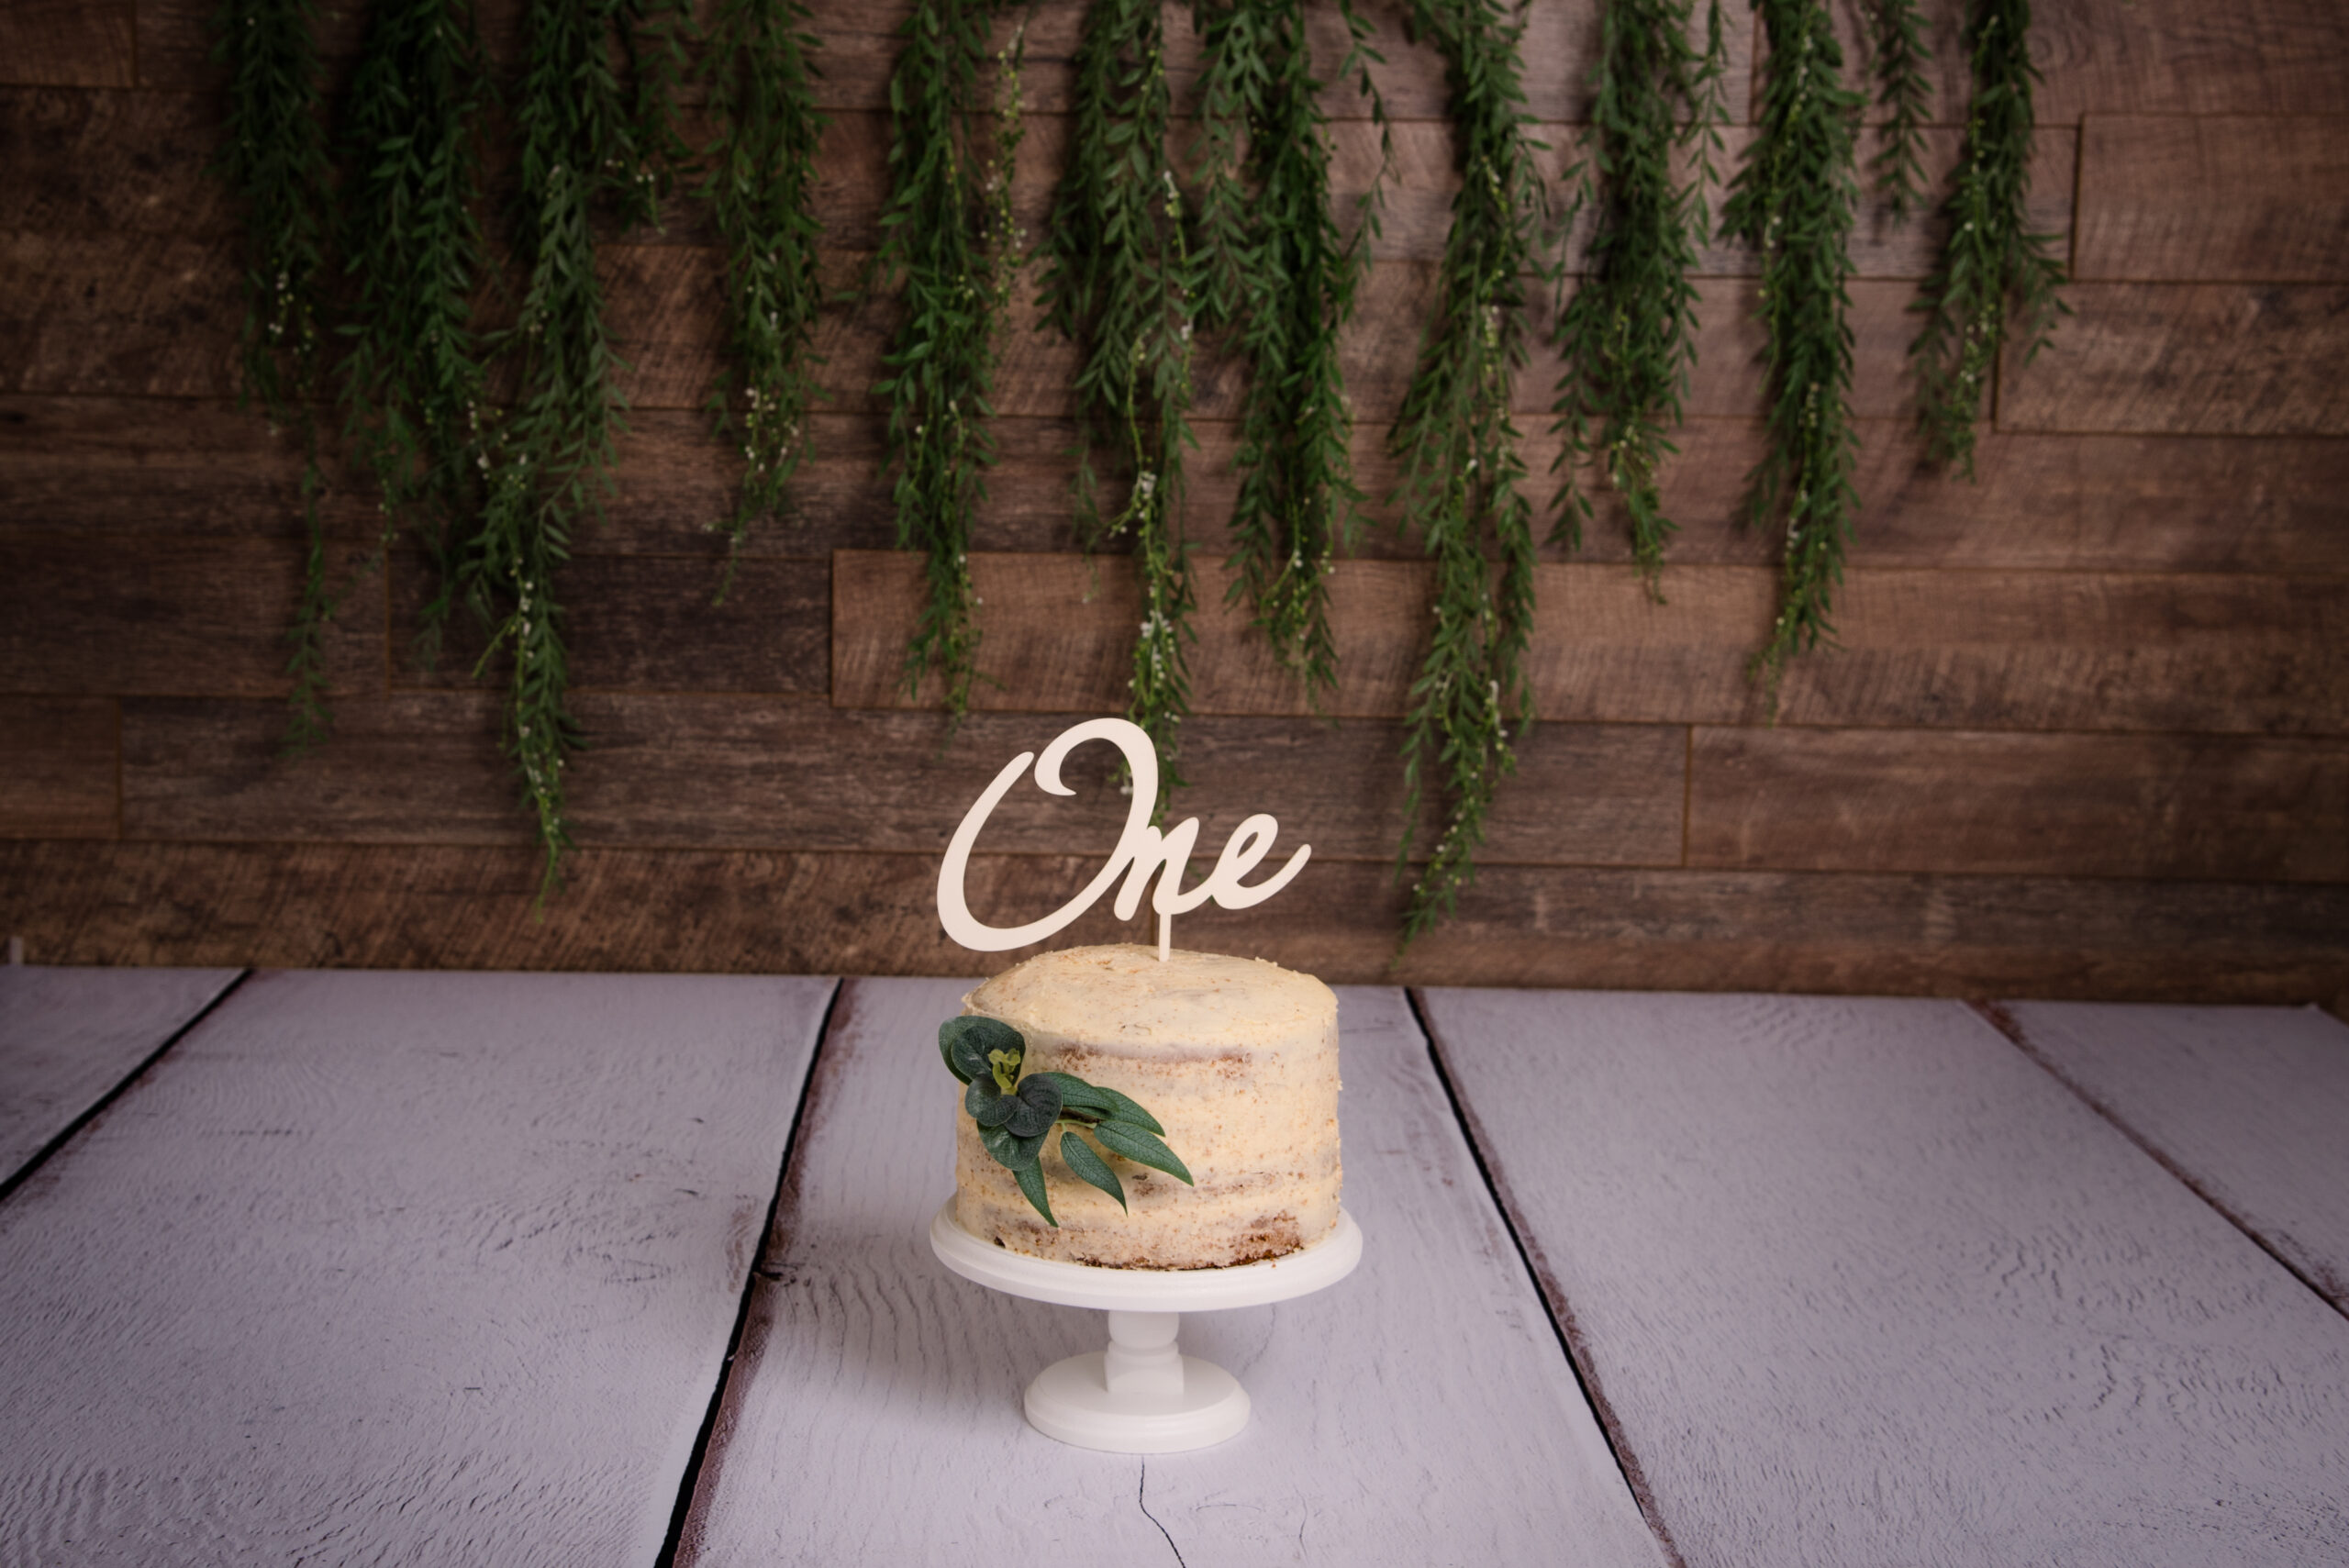 cake promo photos